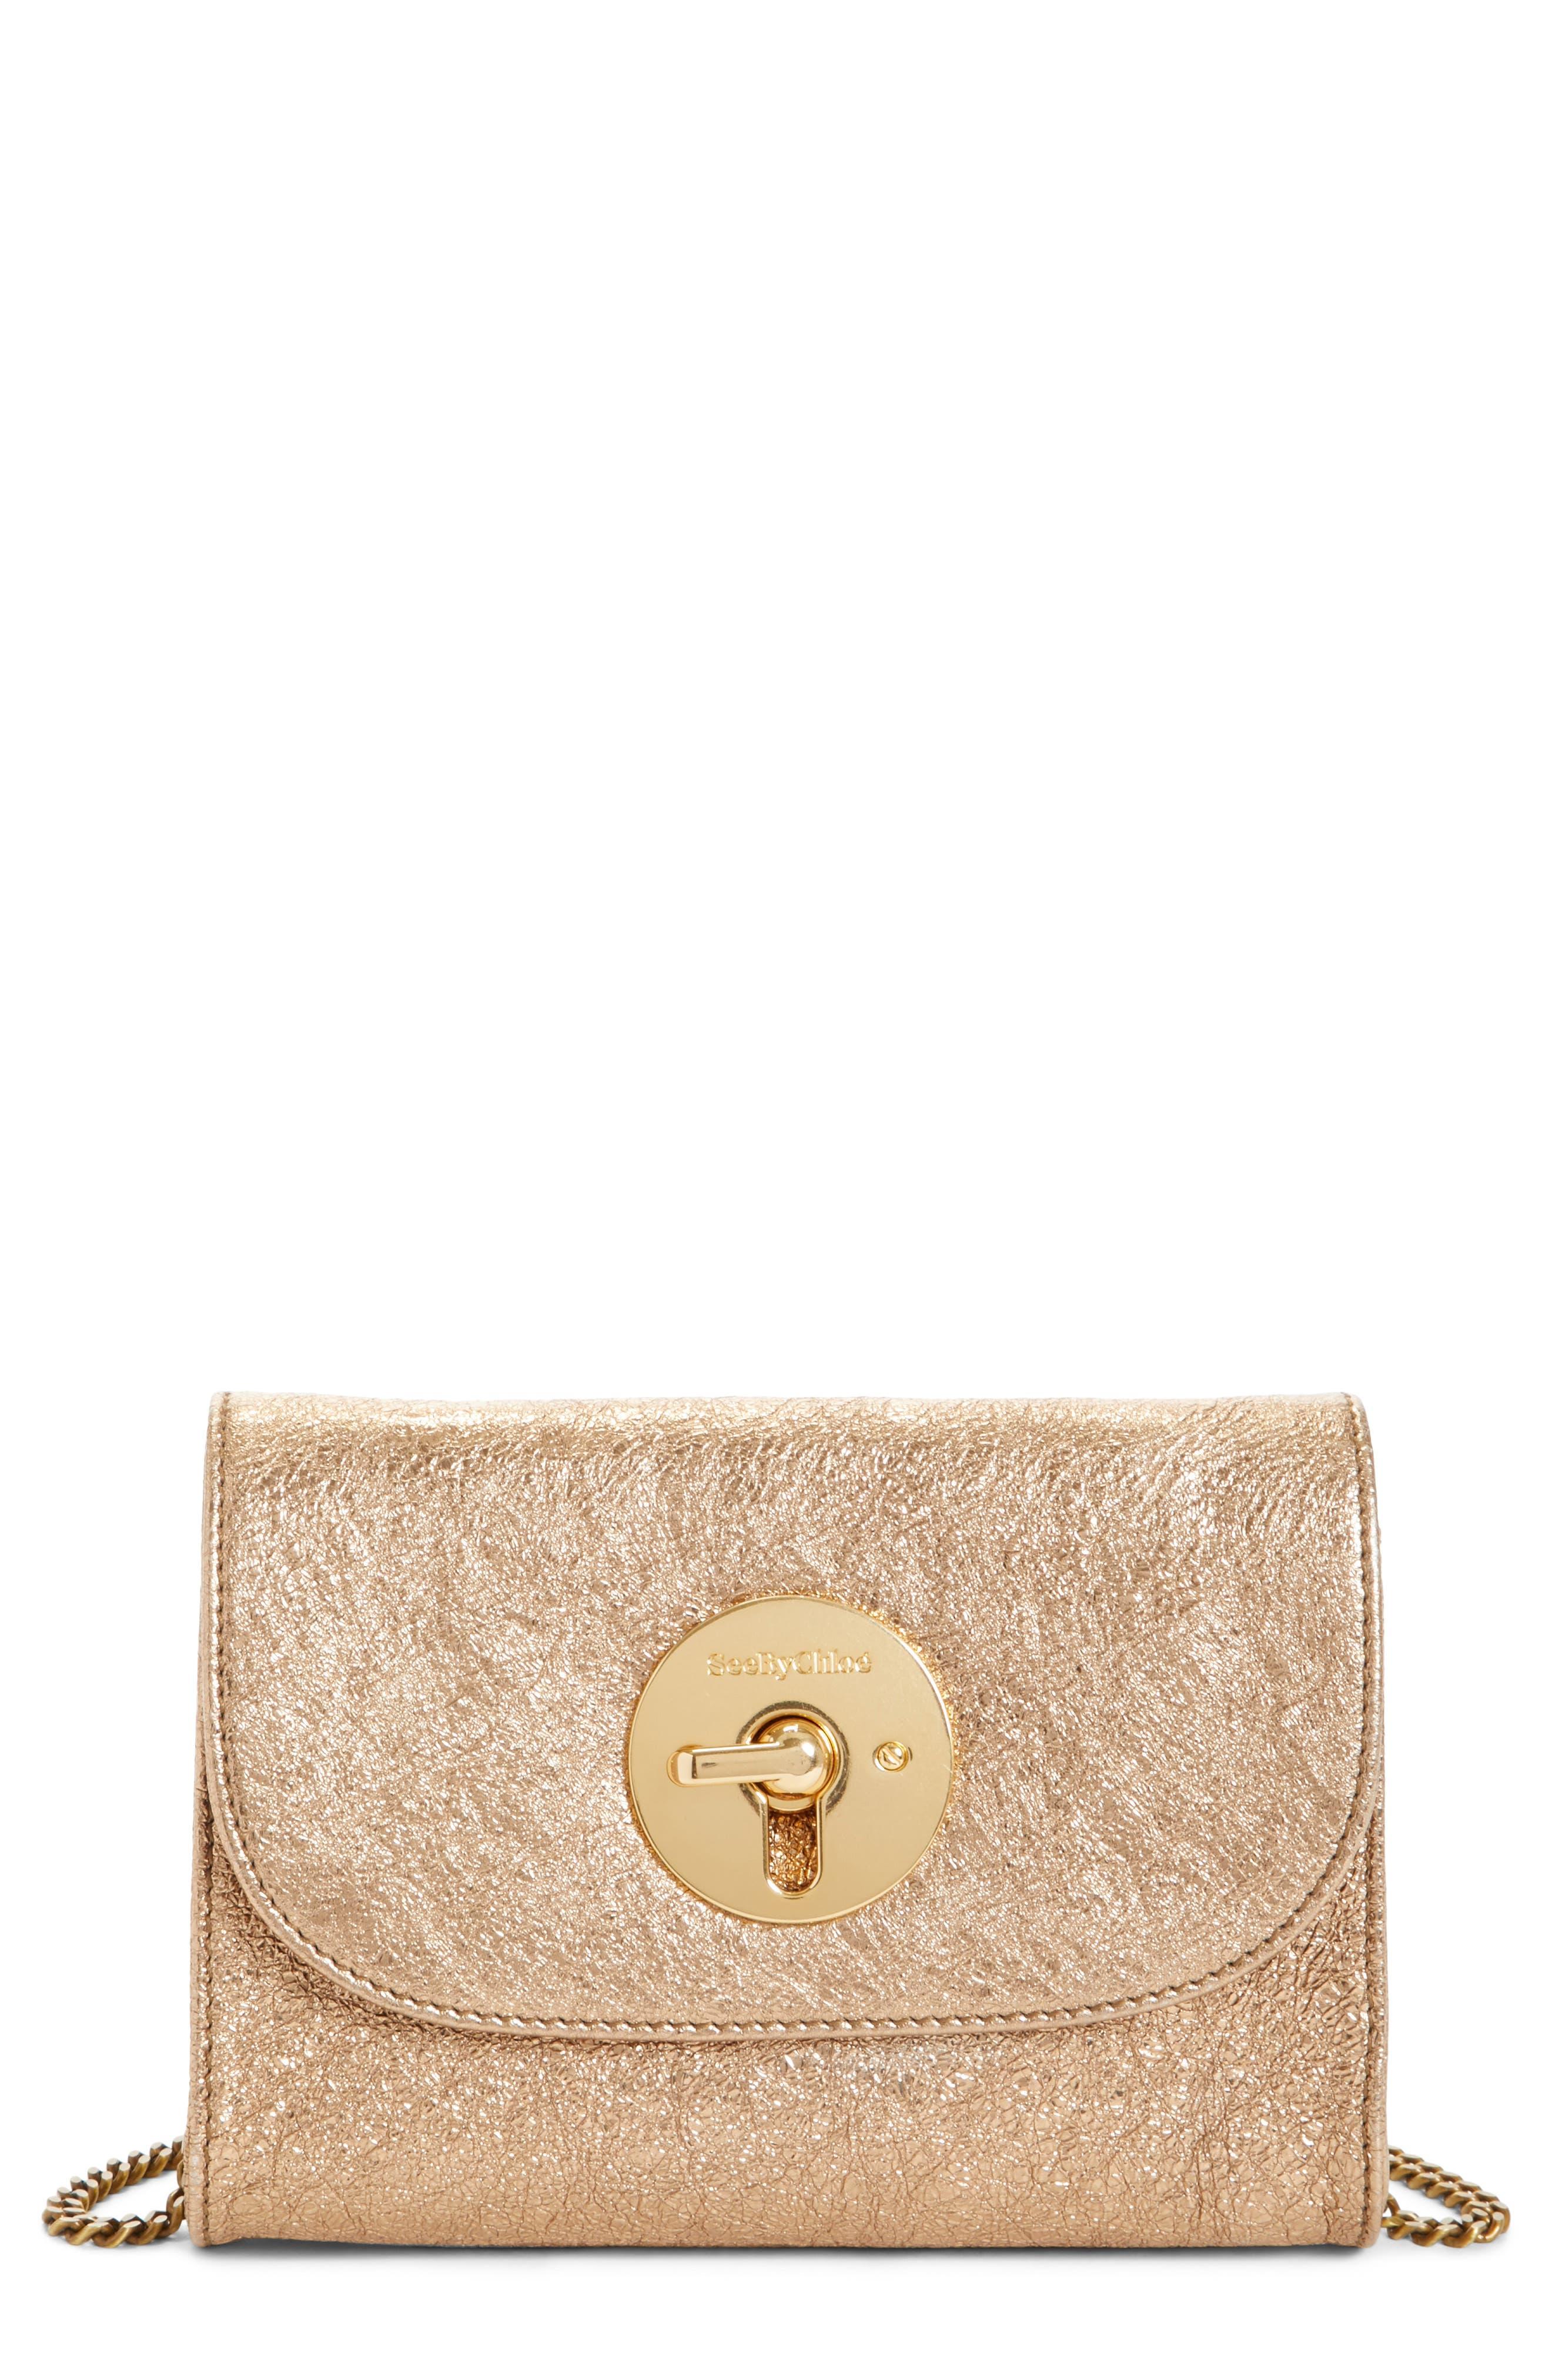 See by Chloé Mini Lois Metallic Calfskin Leather Crossbody Bag